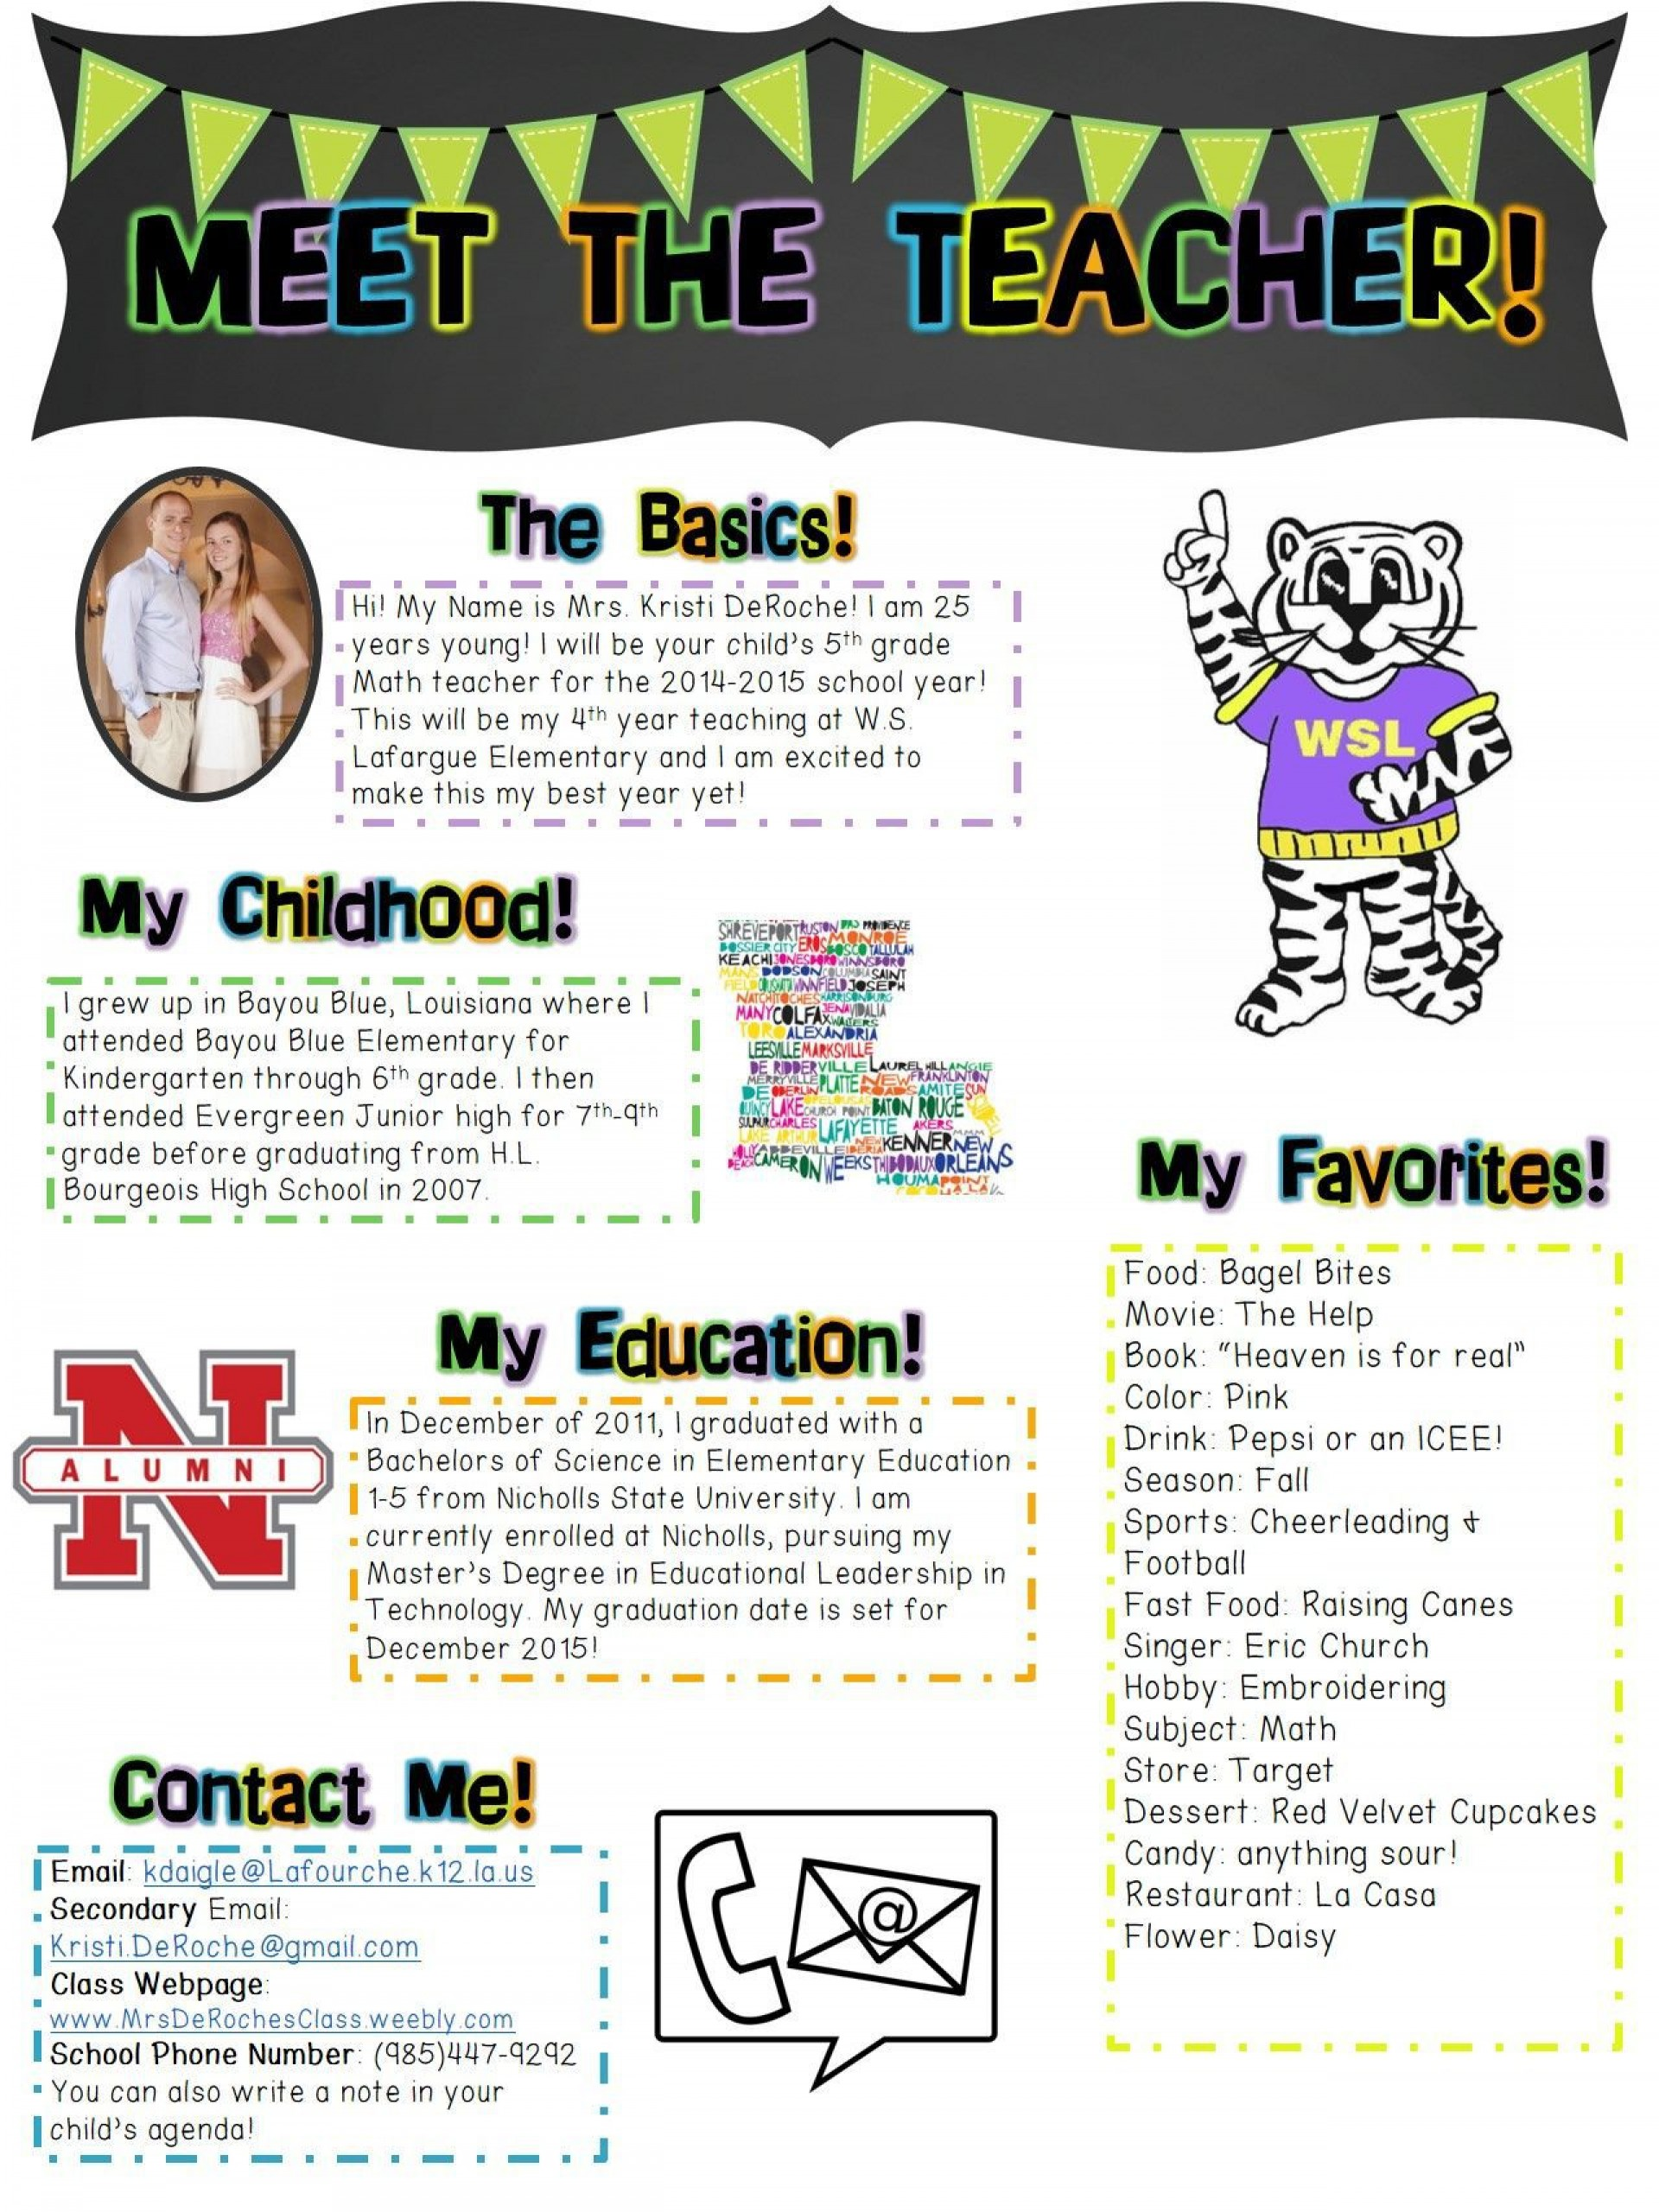 000 Surprising Newsletter Template For Teacher Highest Clarity  Teachers To Parent Free Printable Digital1920